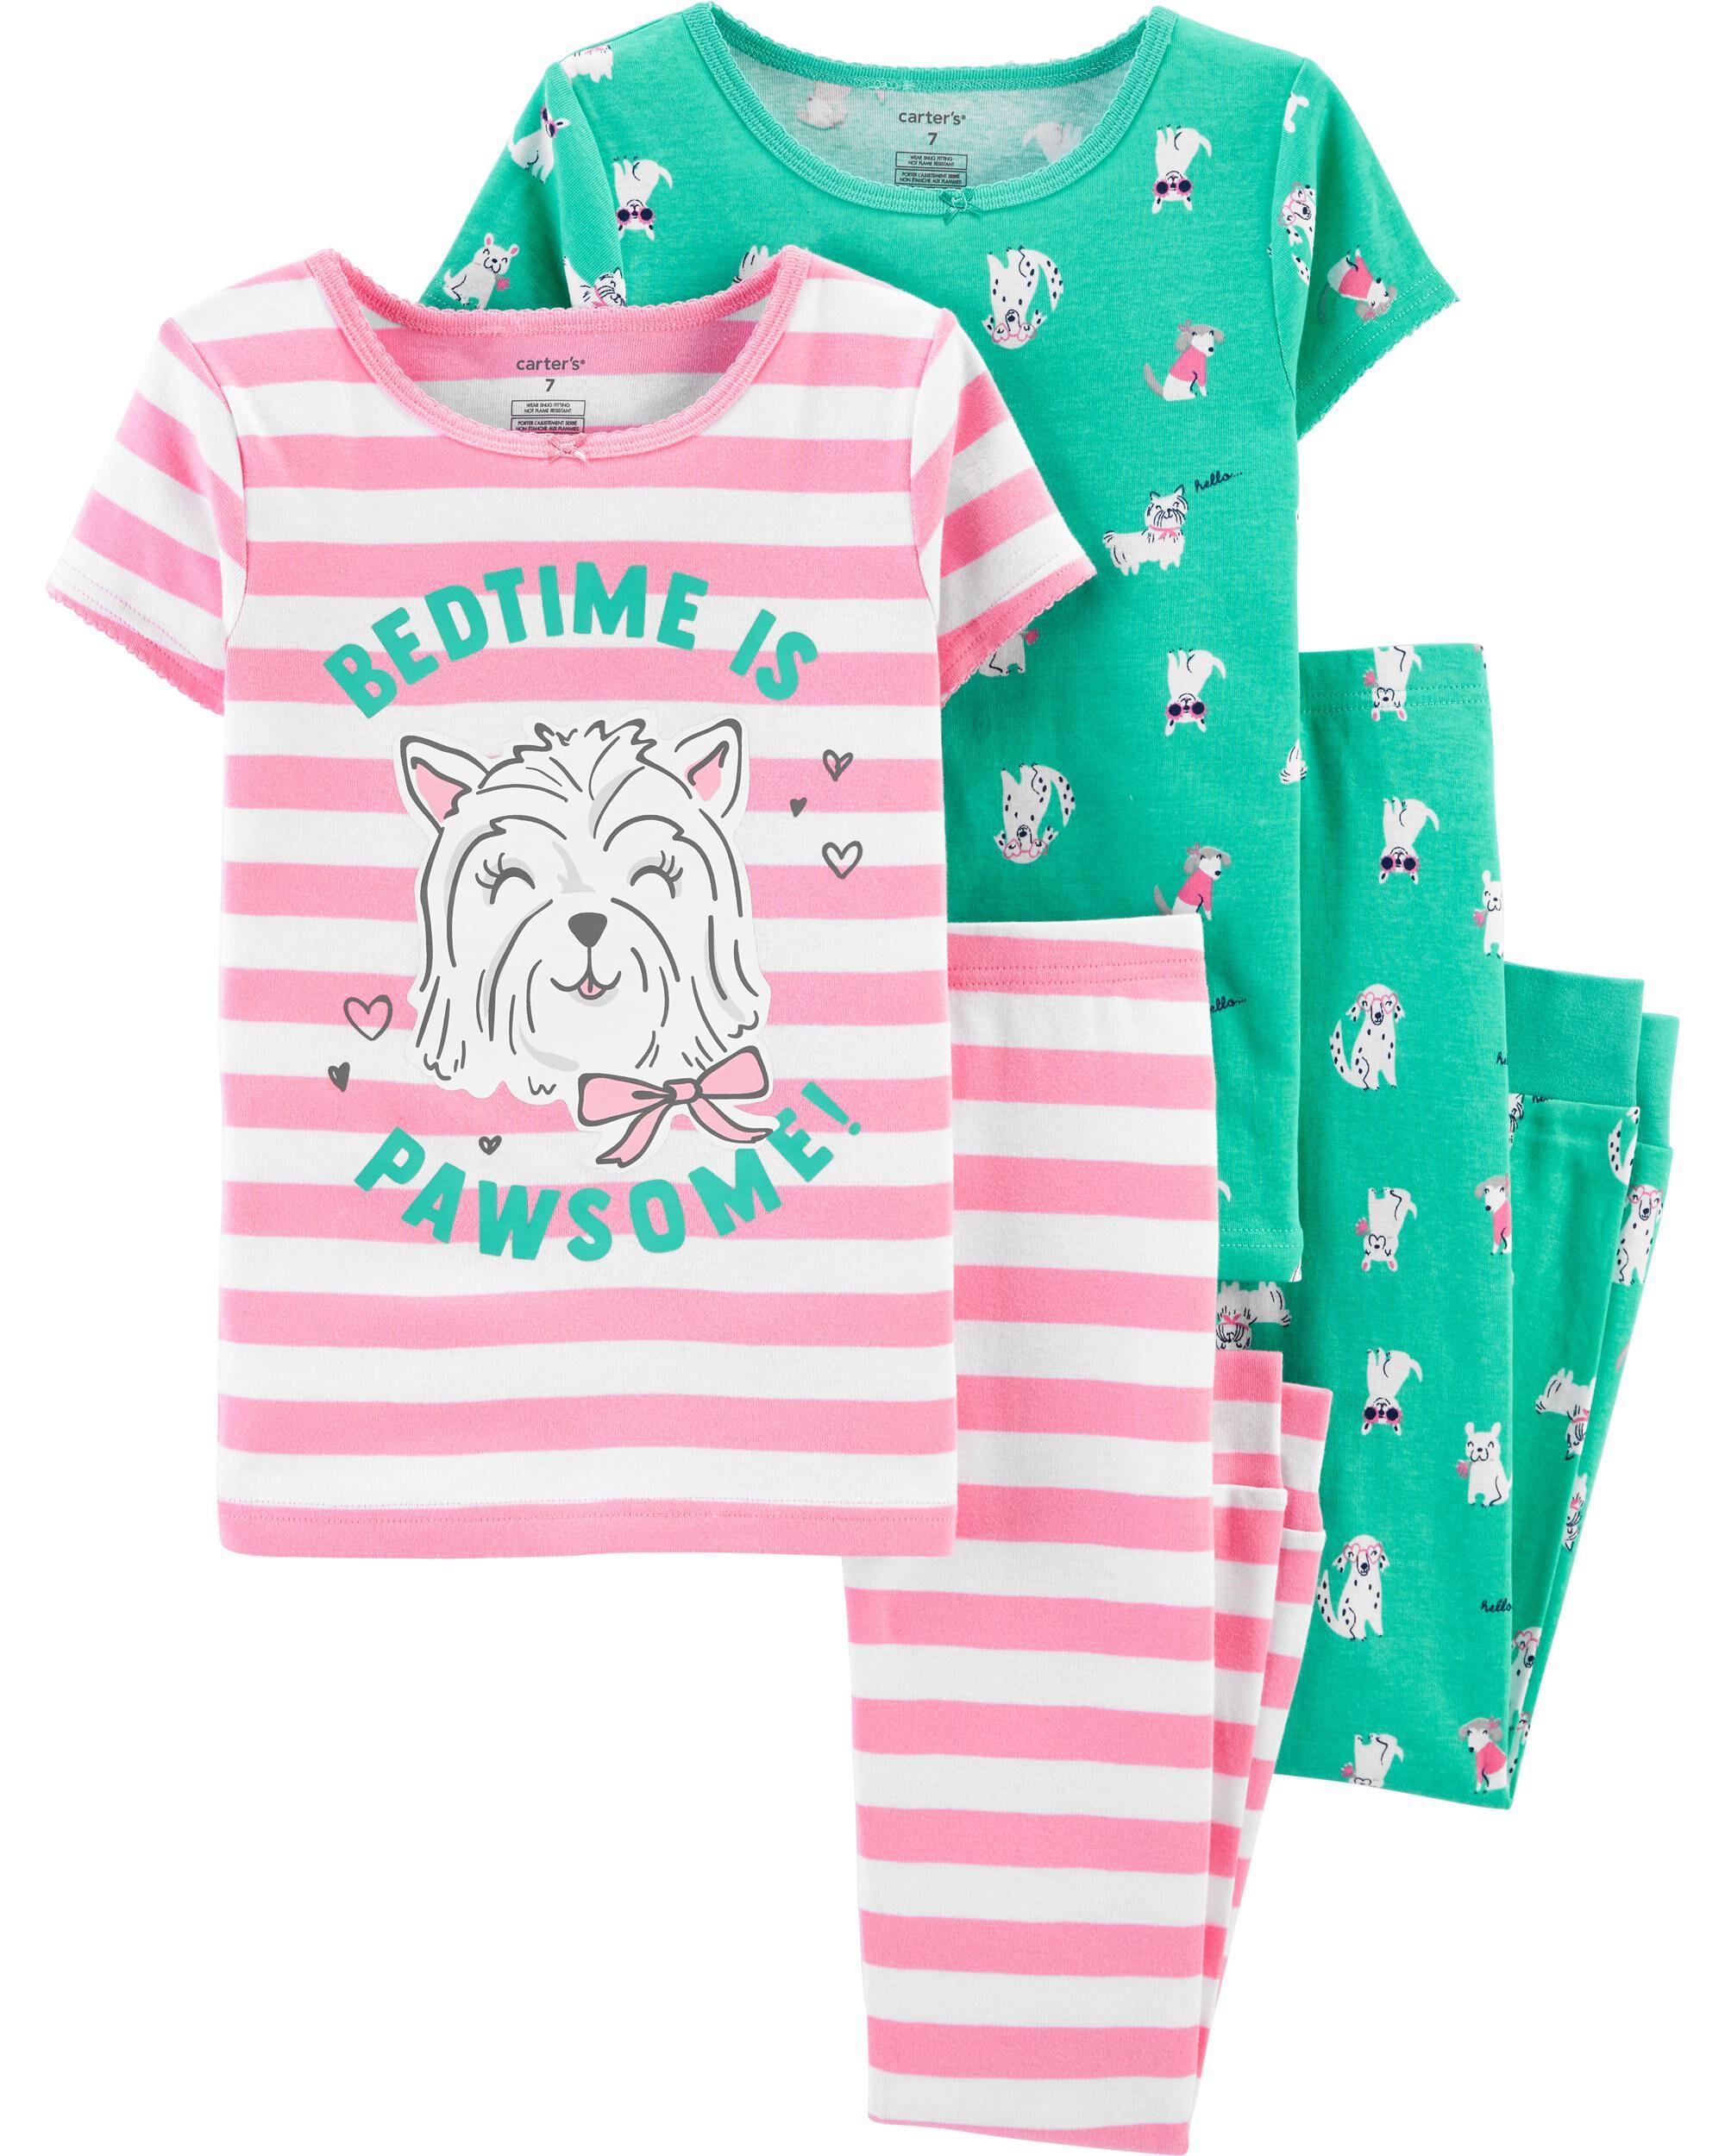 CartersGirls/' 4-Piece Ballerina Snug Fit Cotton PJs NWT pajamas dance pink